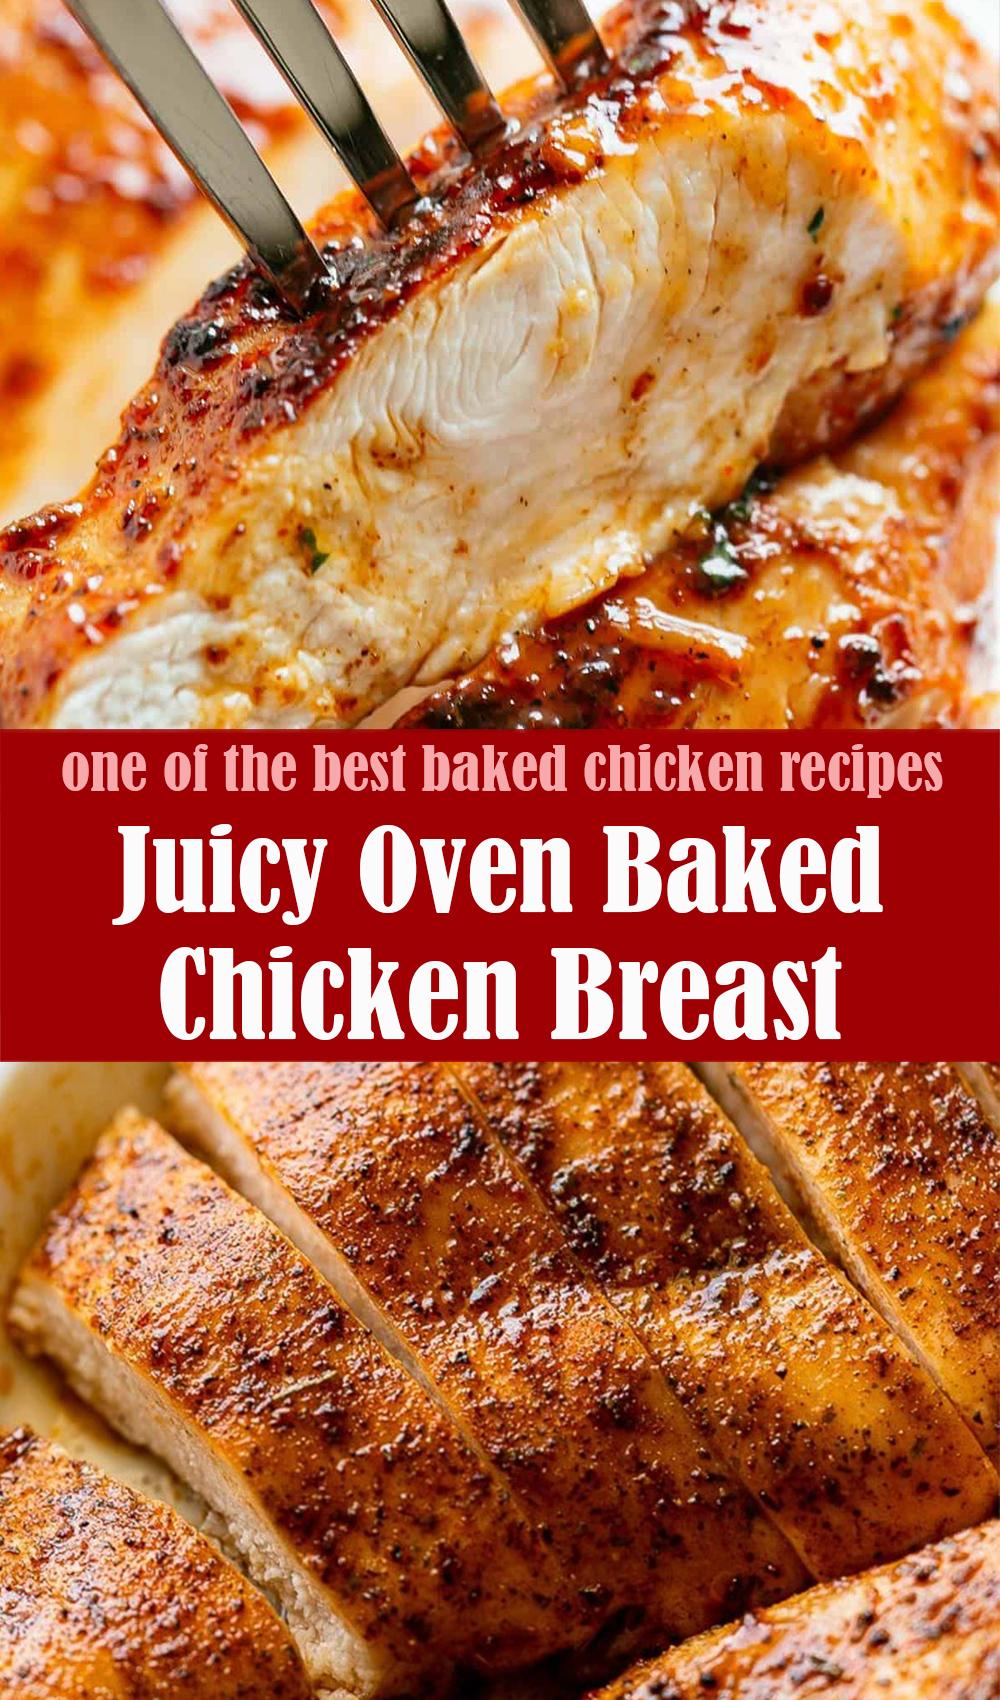 Delicious Juicy Oven Baked Chicken Breast